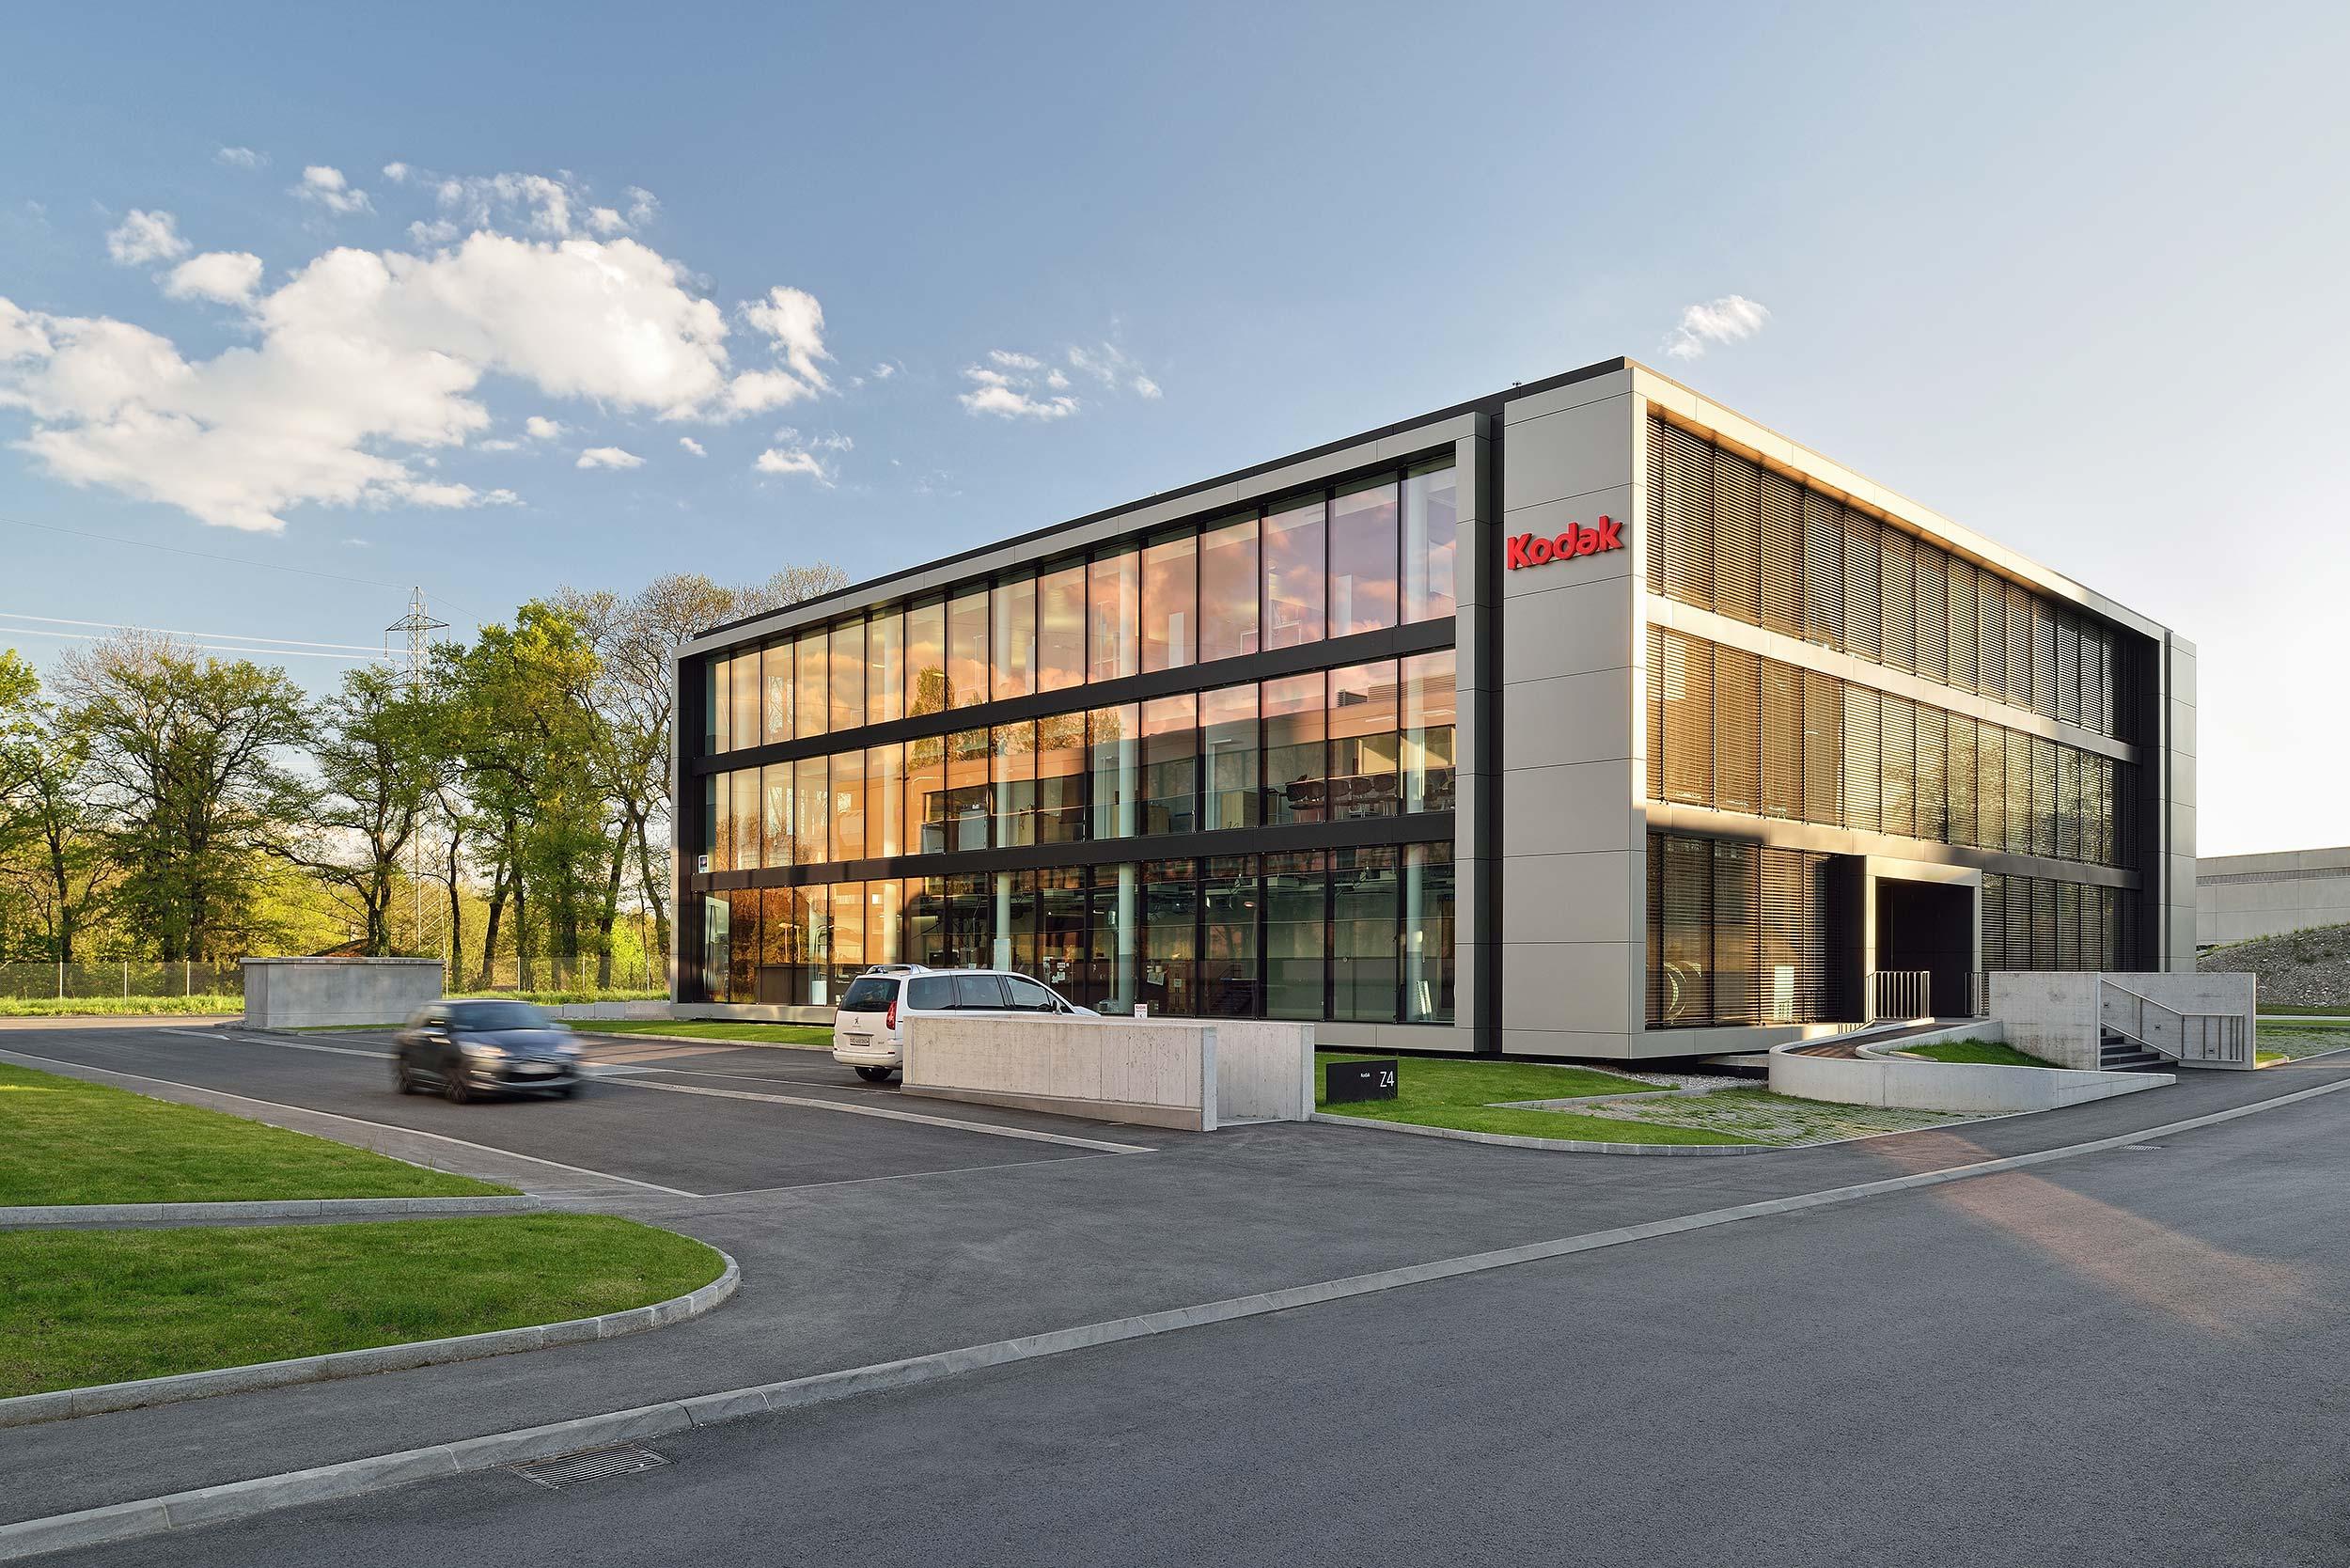 Kodak - Terre Bonne Park in Zwitserland - architectuurfotograaf Chiel de Nooyer